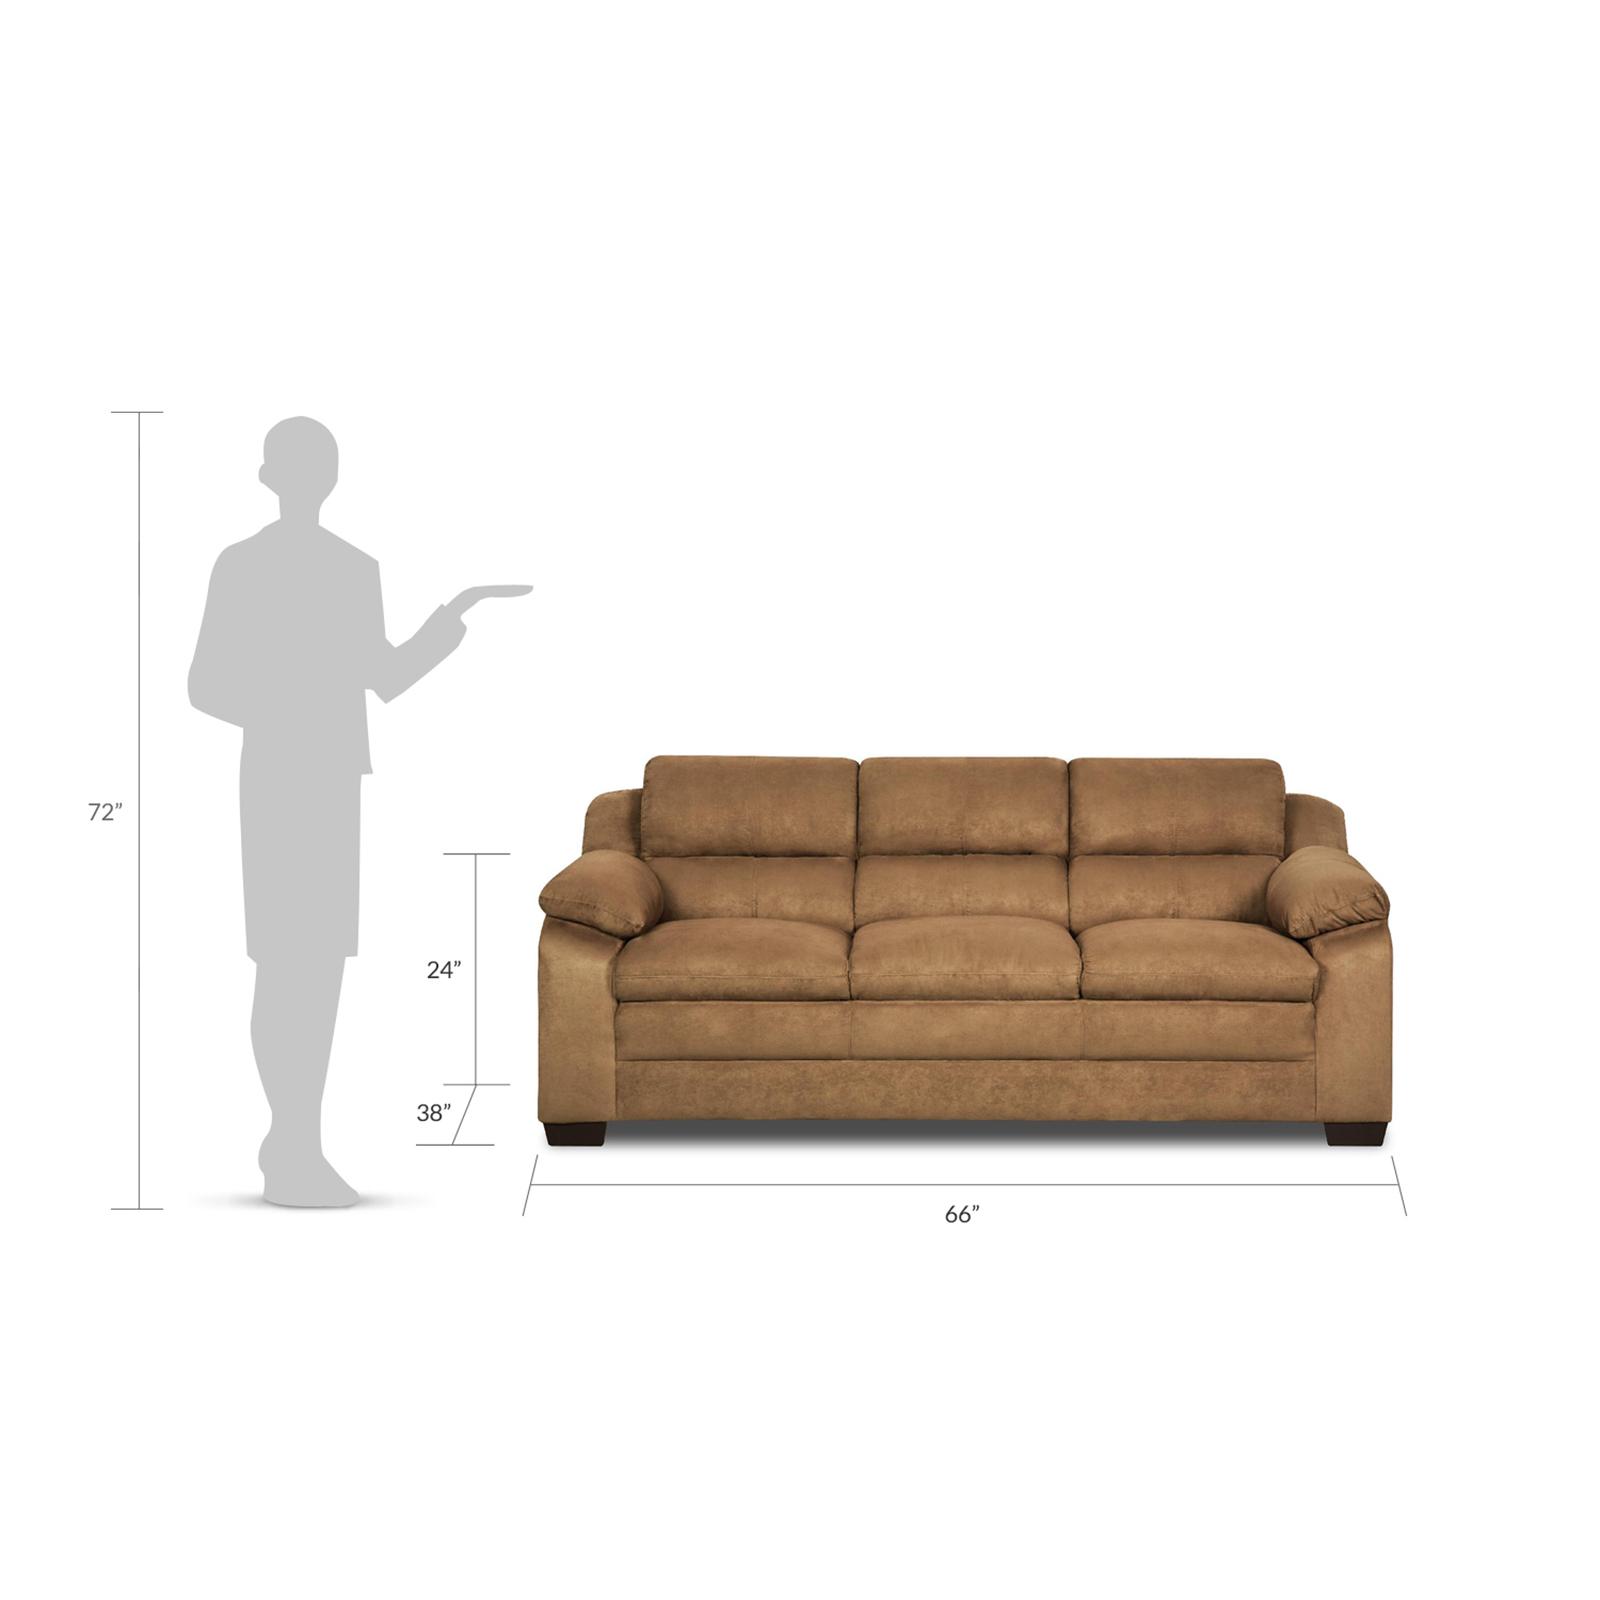 Simmons Upholstery Bixby Pillow-Top Sofa - Latte